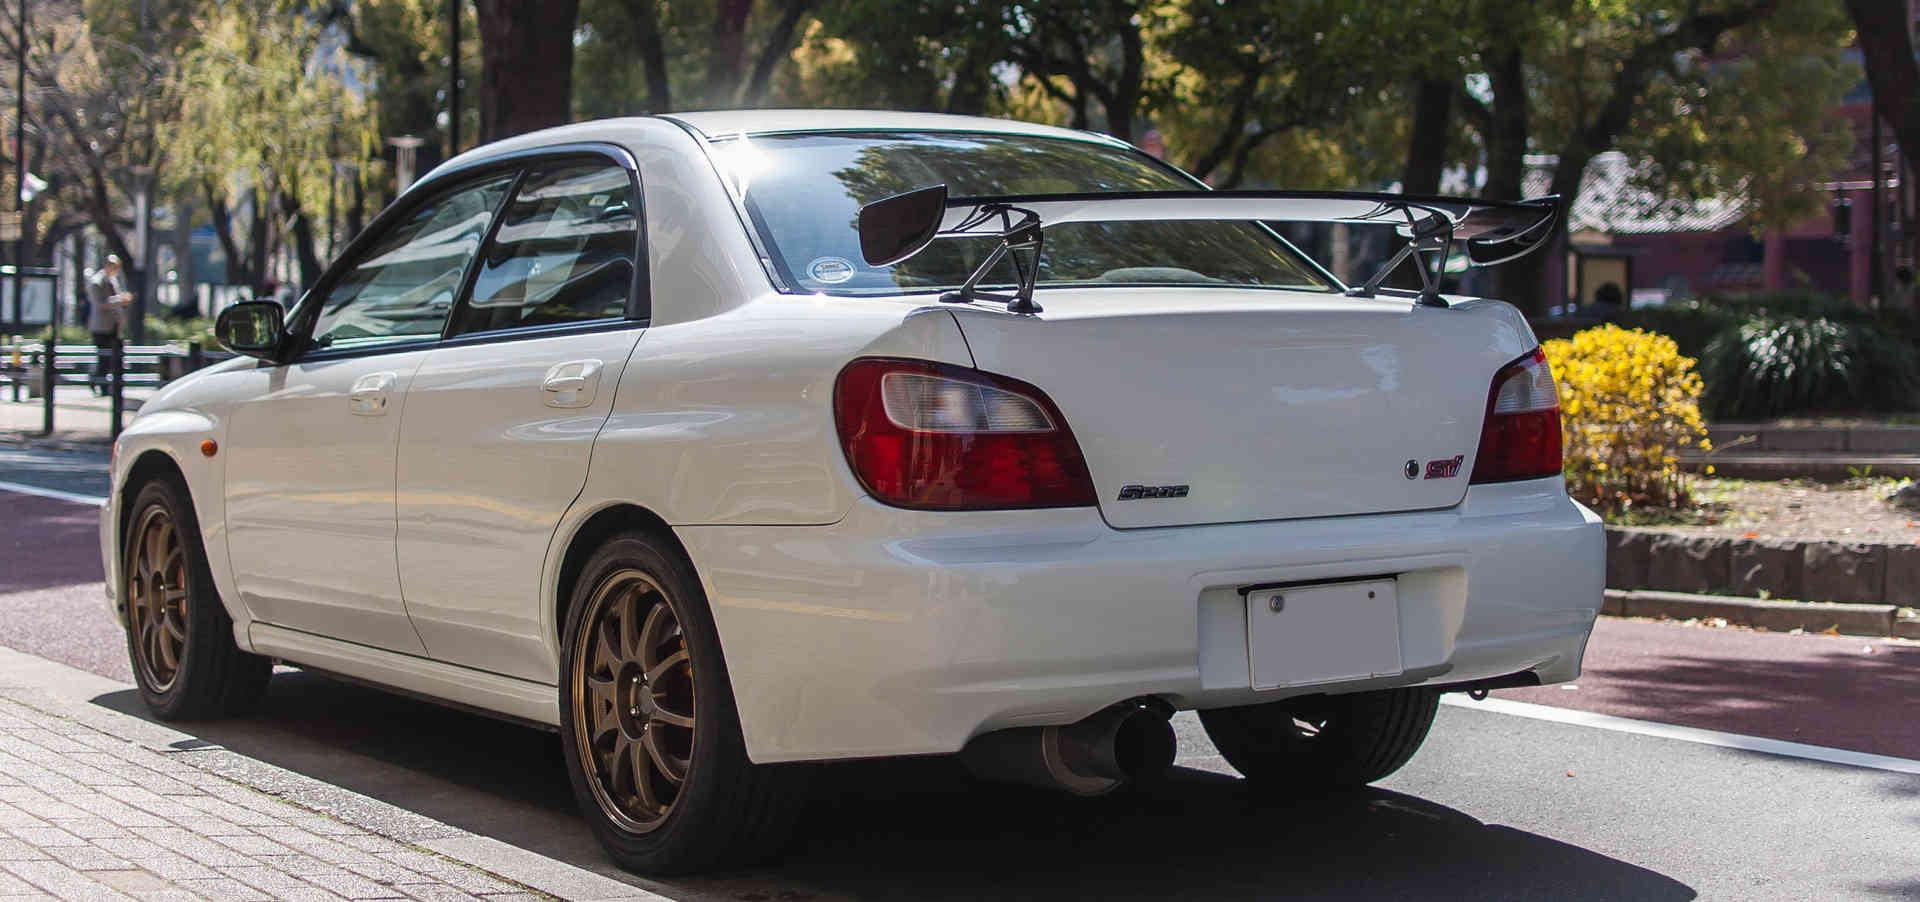 SUBARU WRX STI S202 (MT)